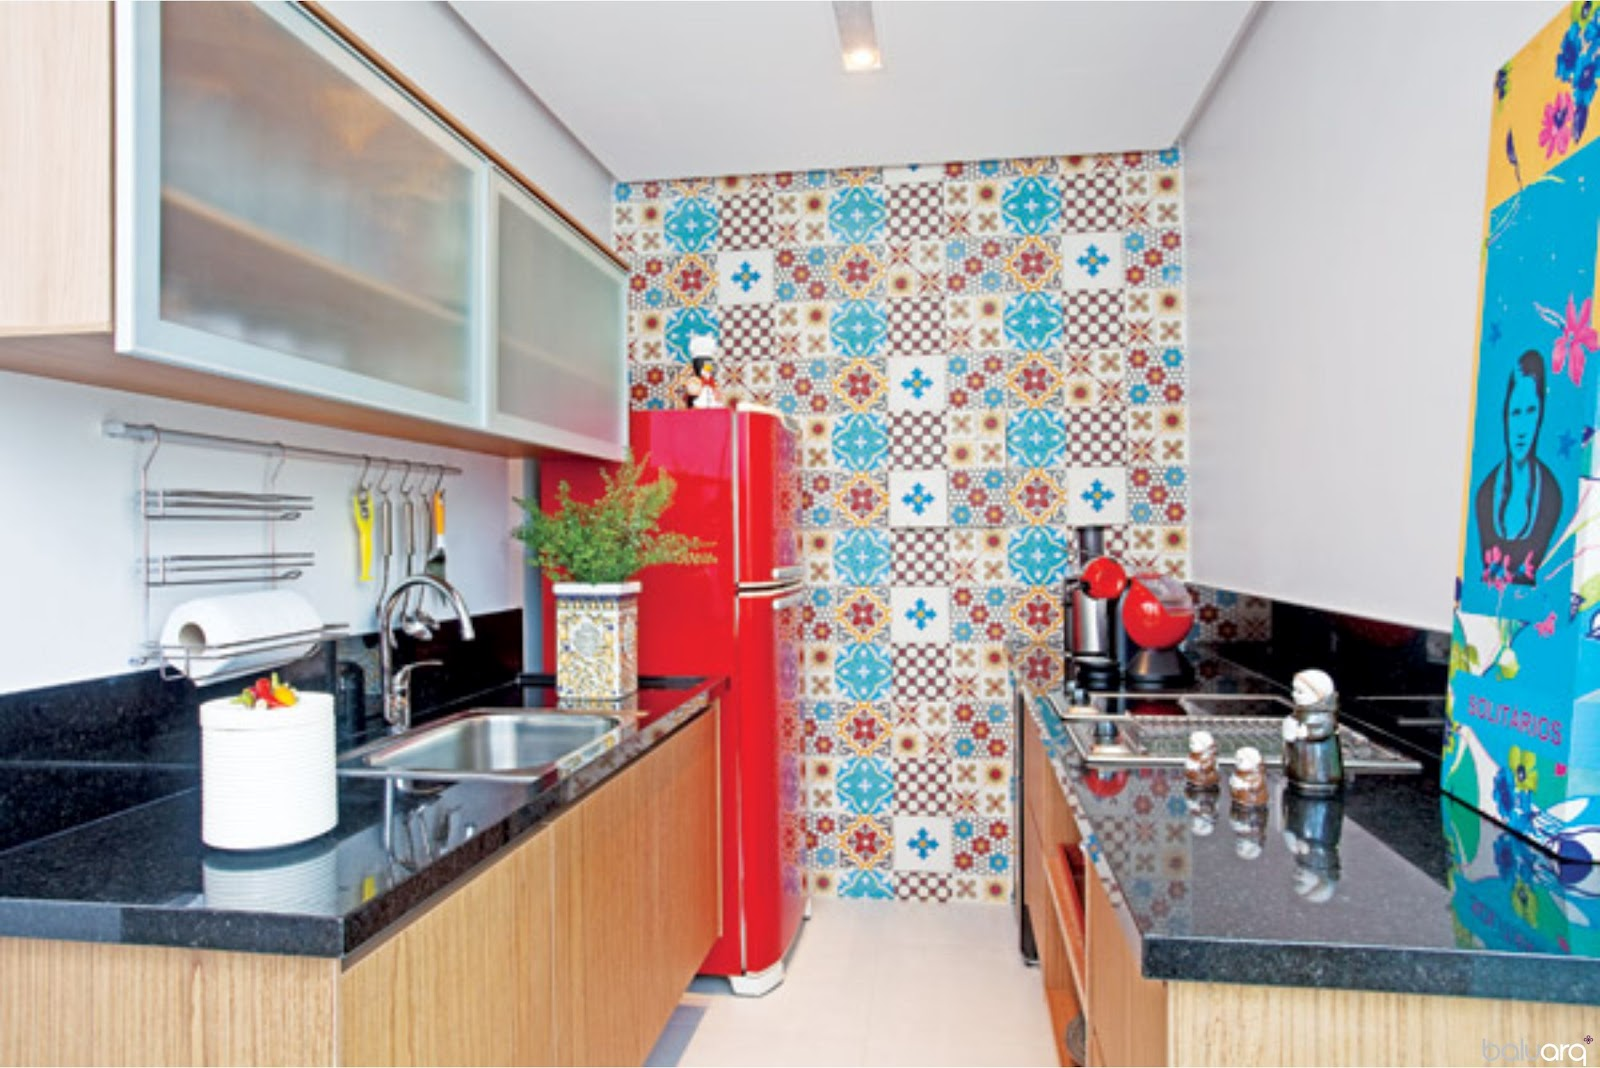 Oficina de Arquitetura: Ladrilho hidráulico e Azulejos Estampados #1093BB 1600 1068